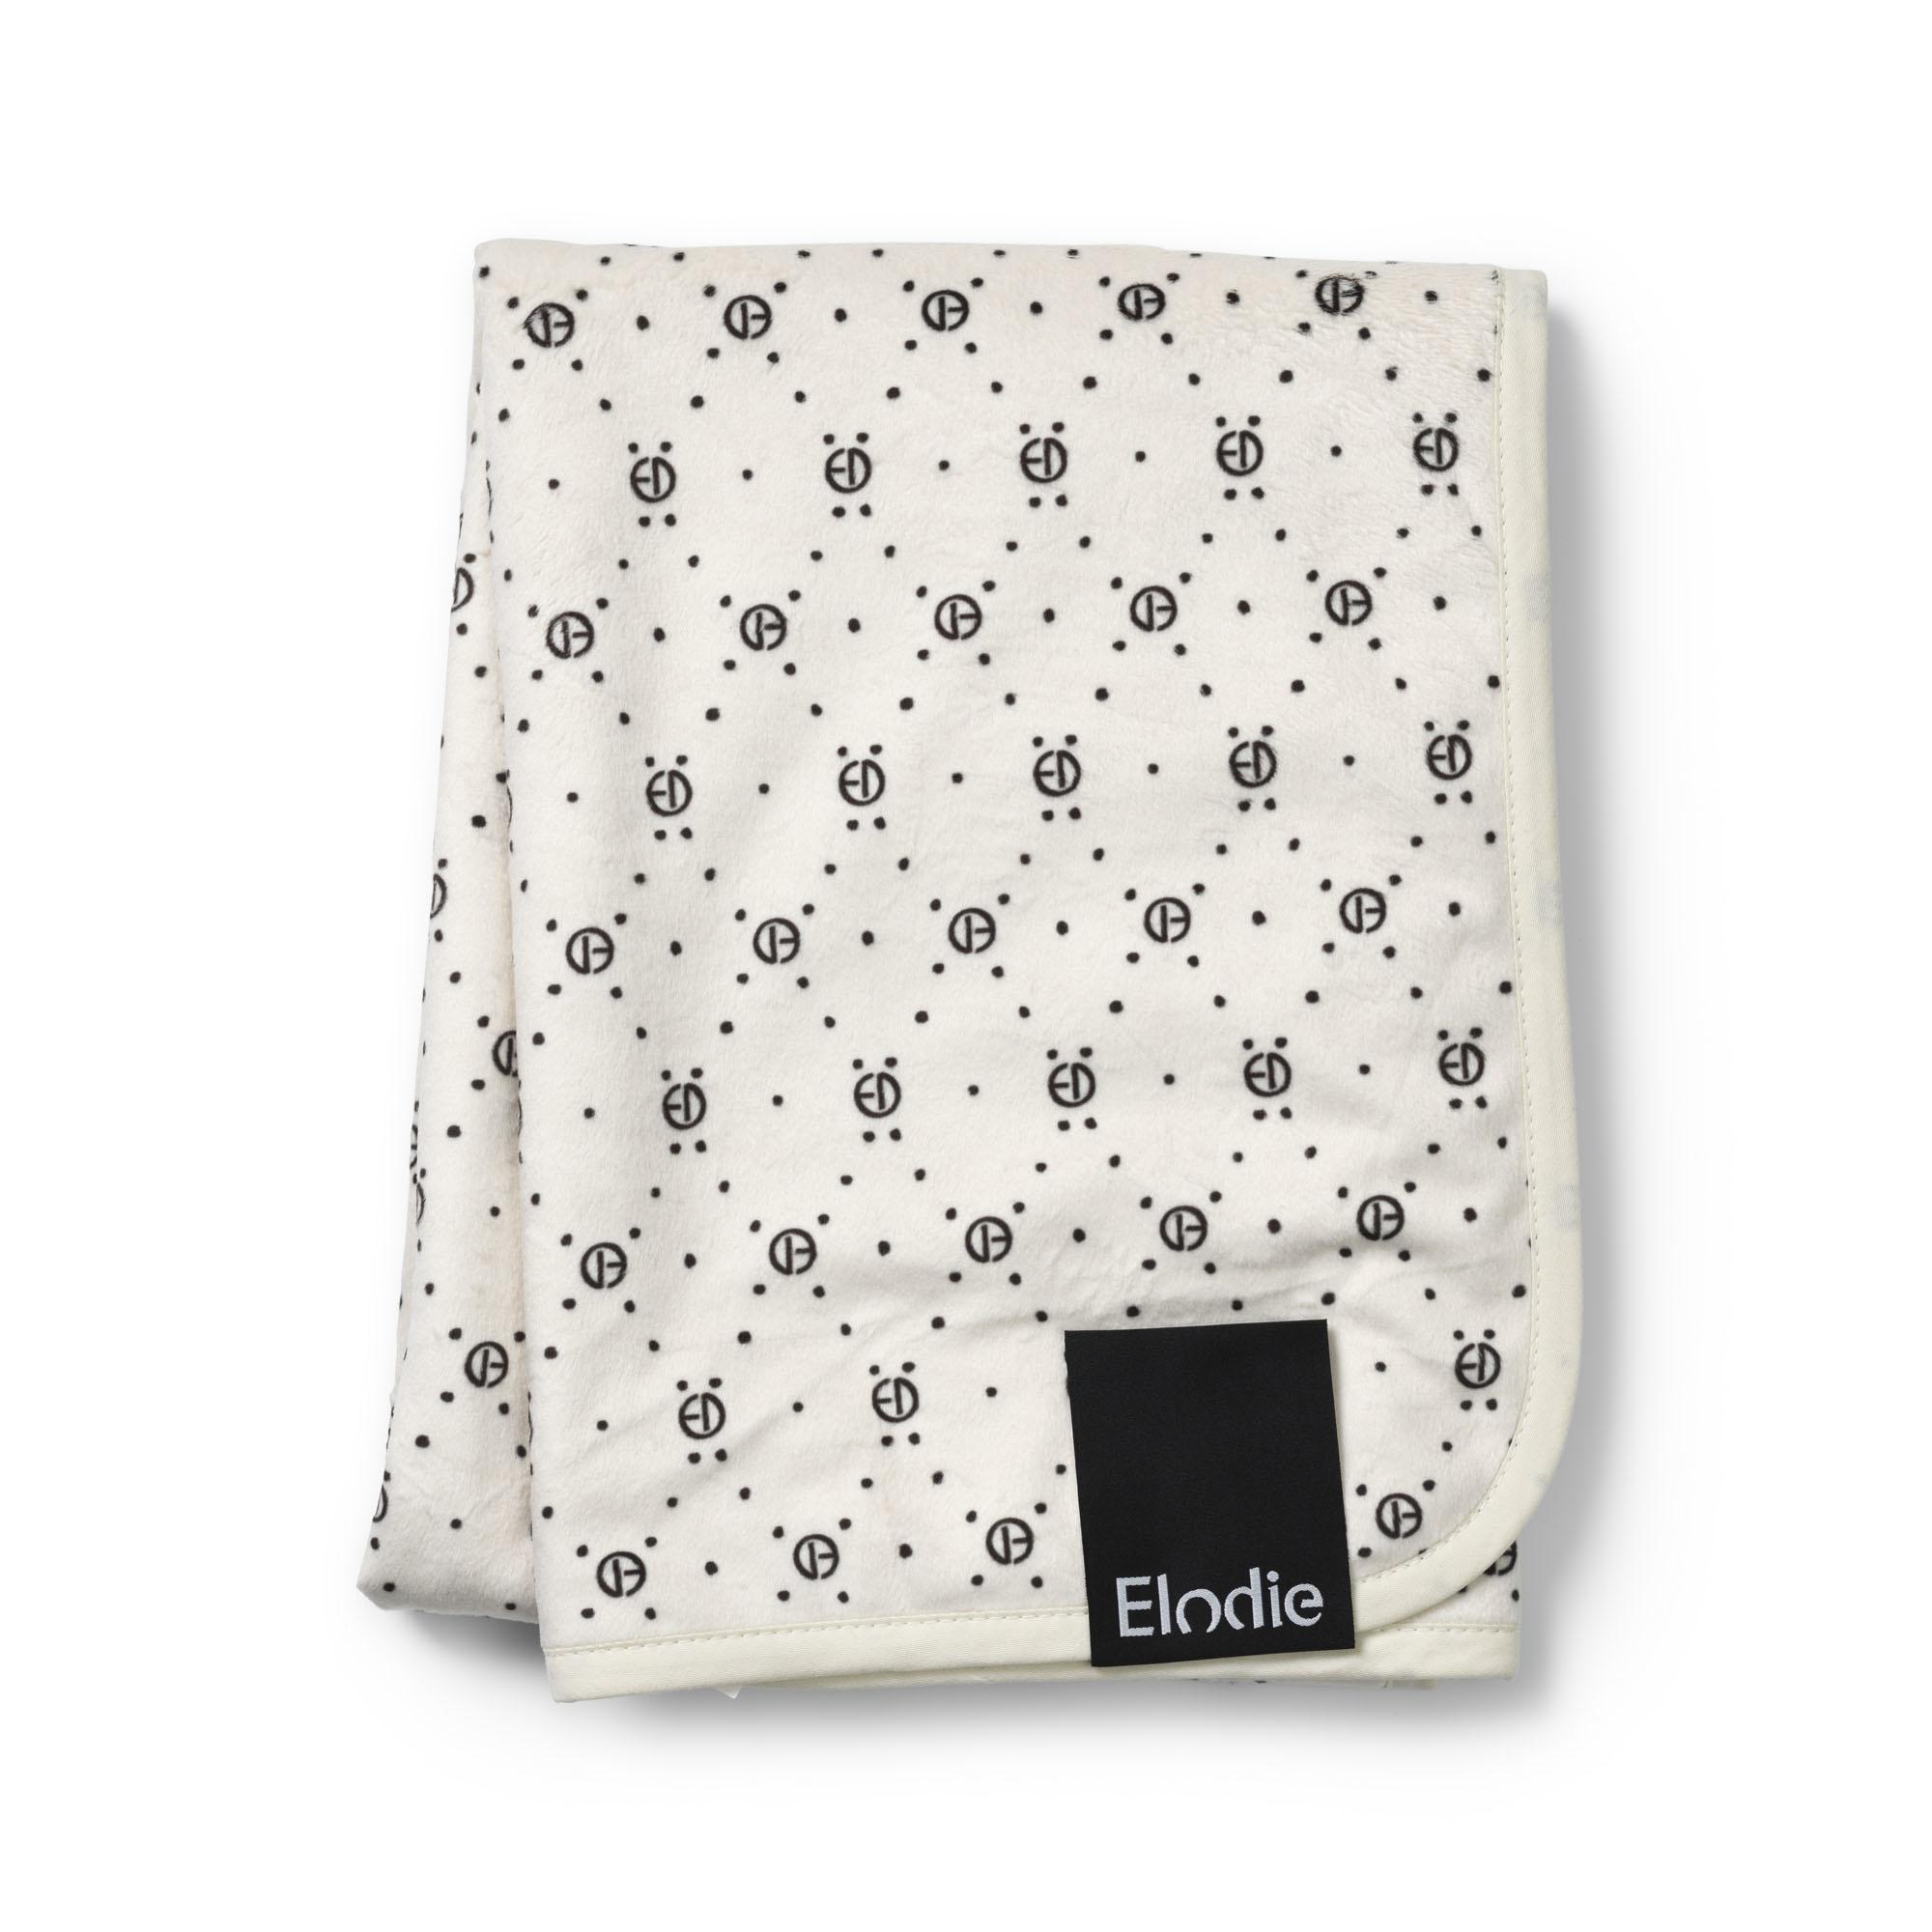 Elodie Details Elodie Pearl Velvet Decke Monogramm 70 x 100 cm